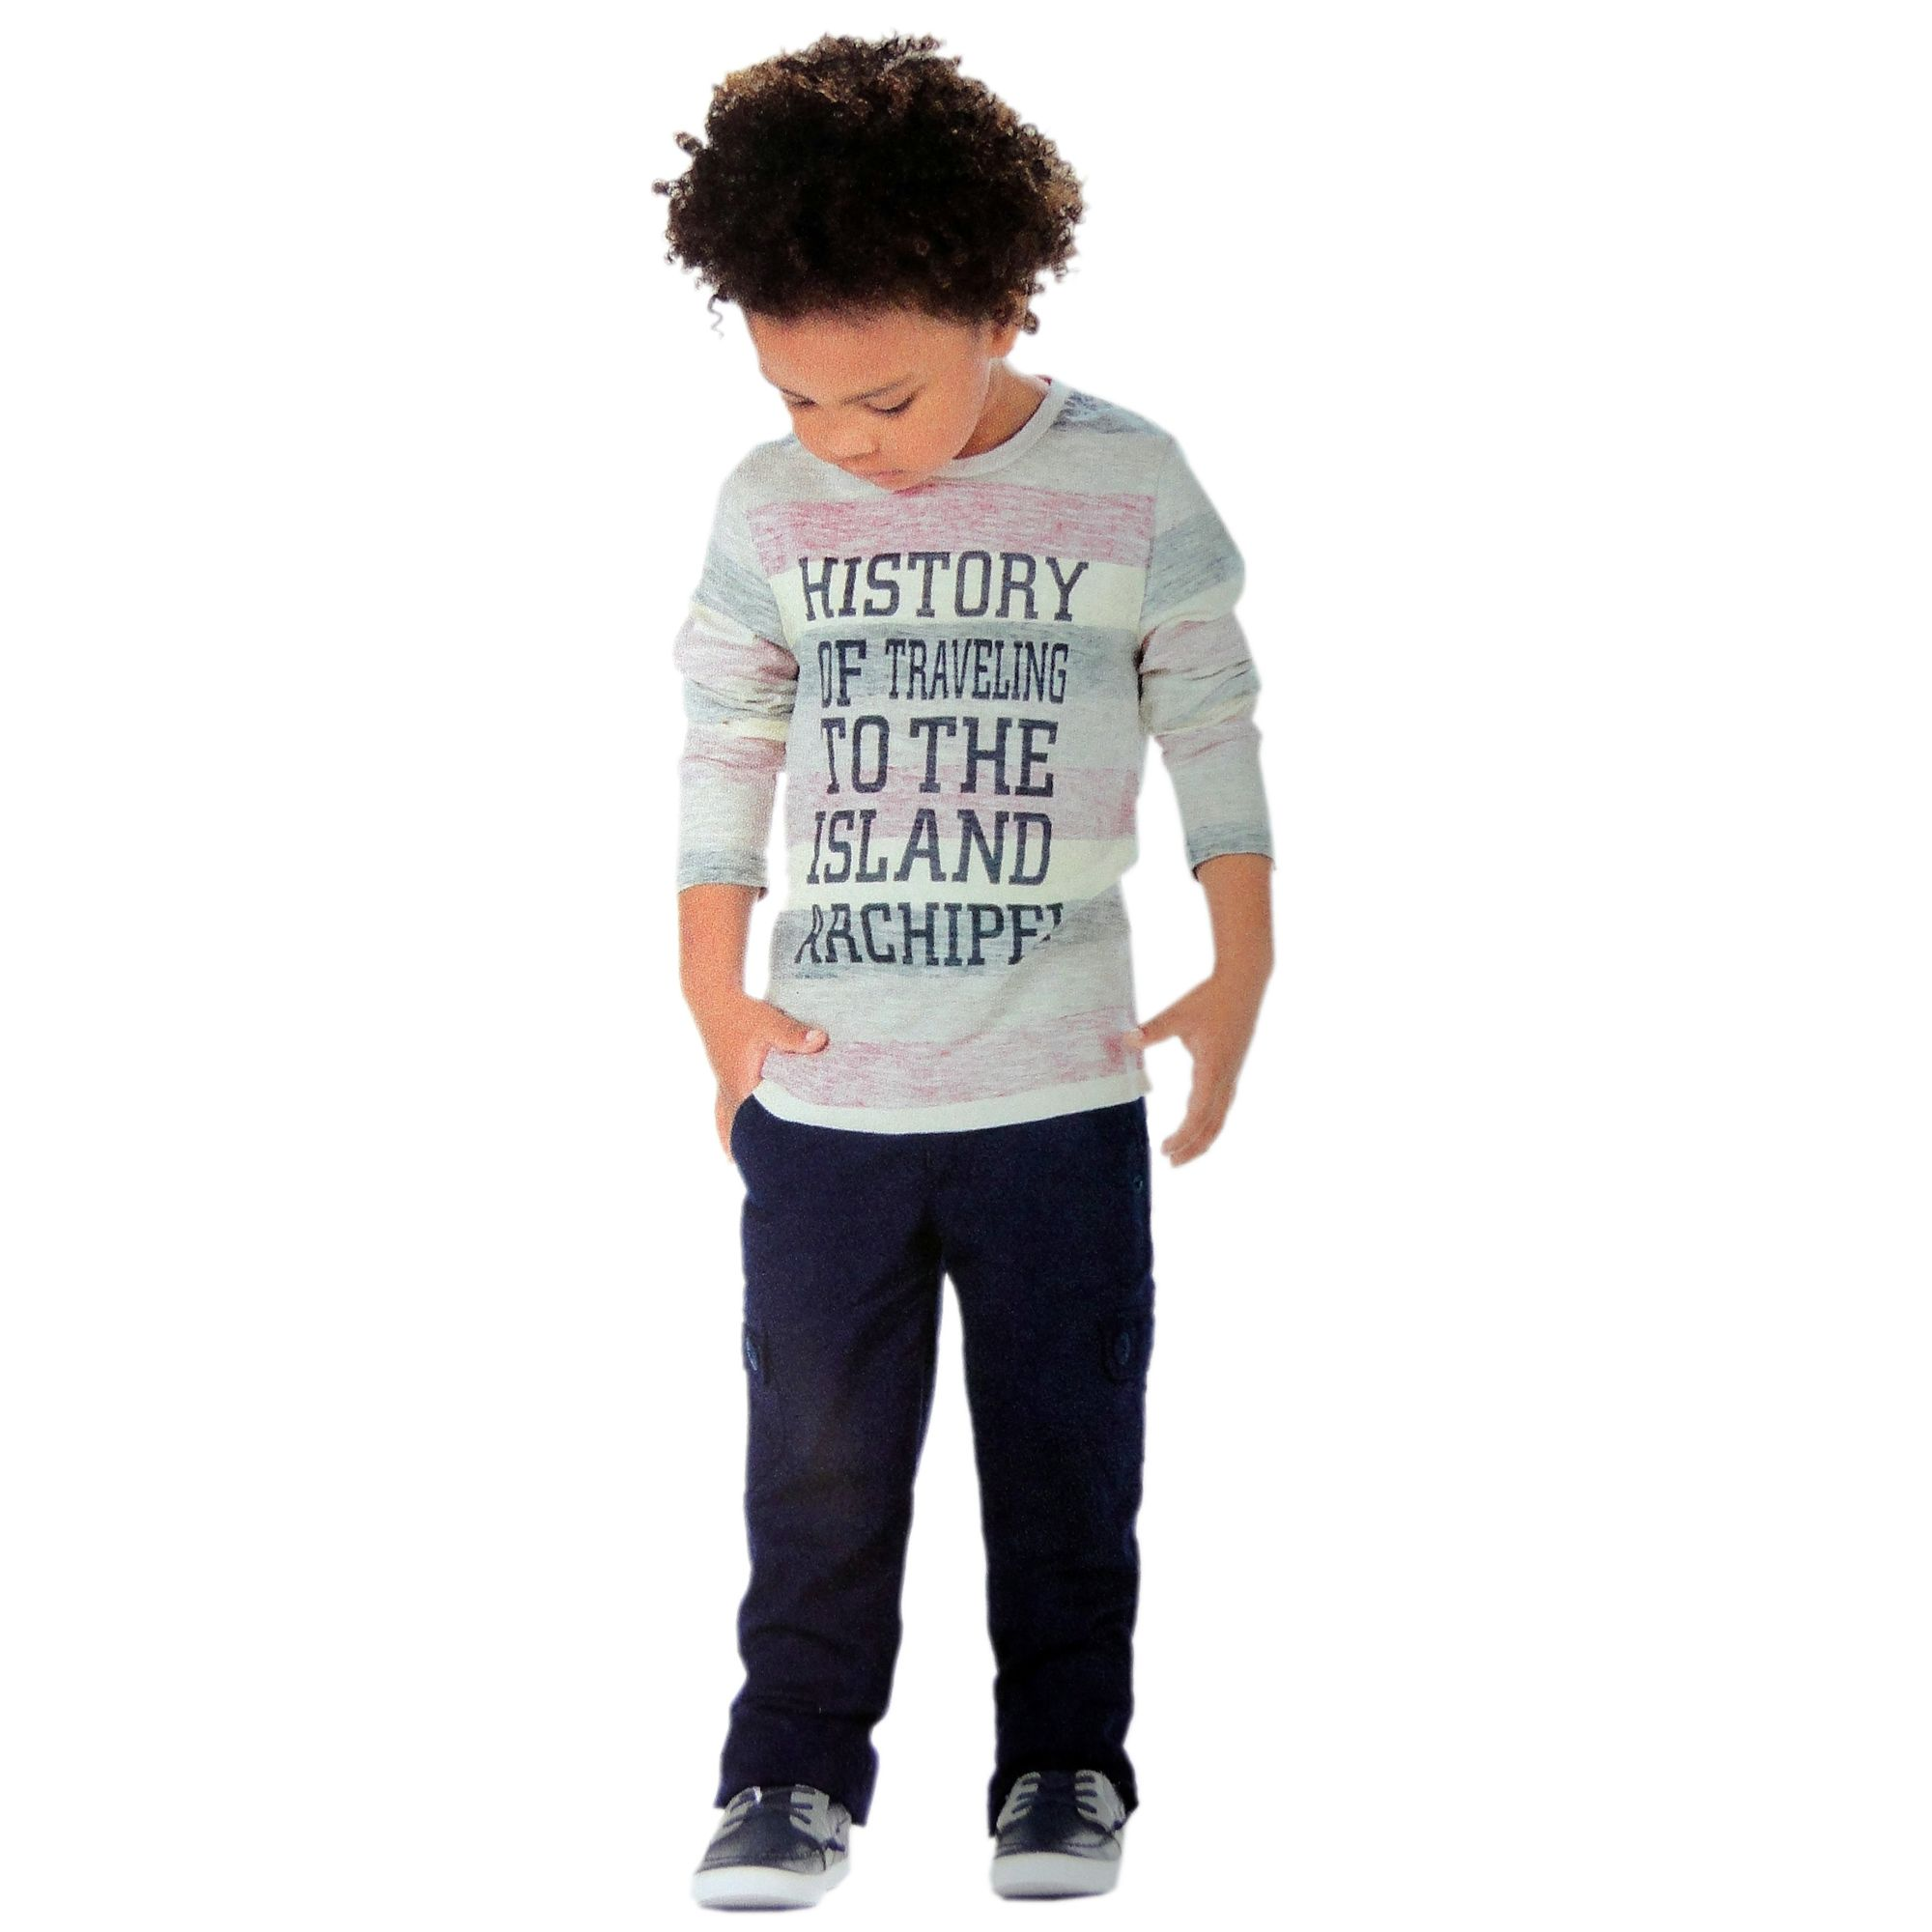 conjunto-menino-camiseta-listras-e-calca-sarja-azul-marinho